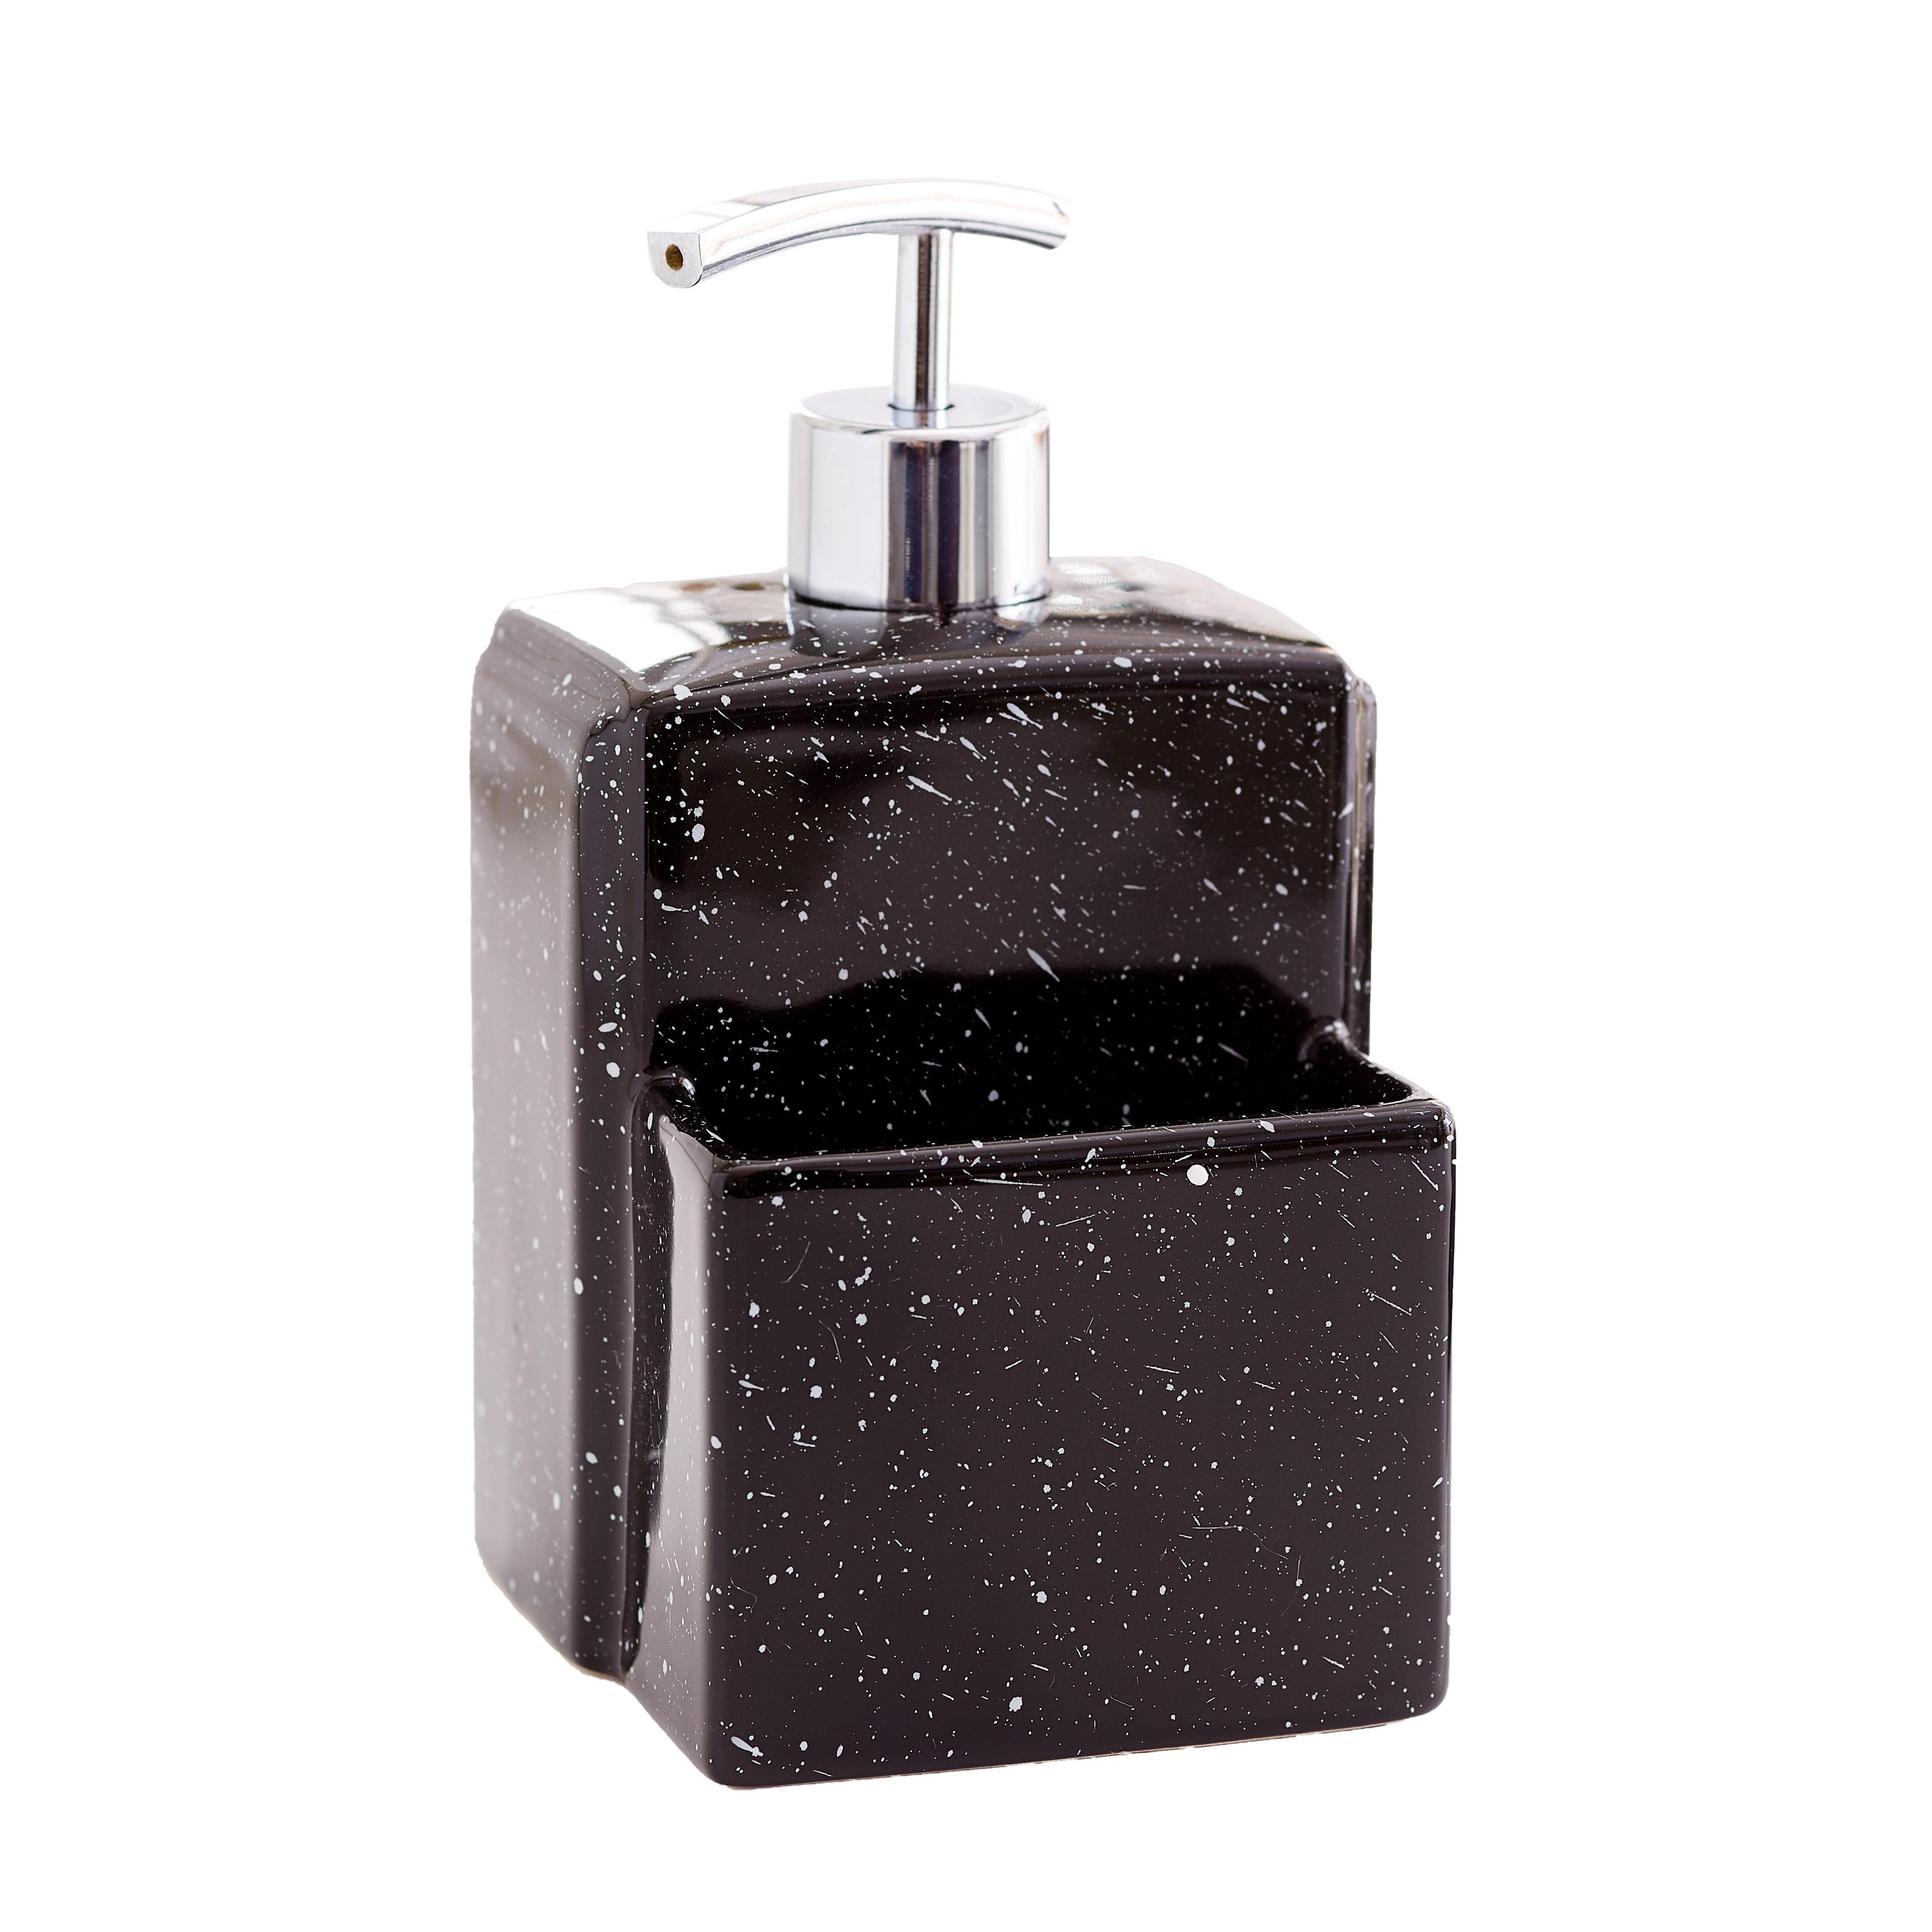 Soap Dispenser With Sponge Holder Kitchen Sink Caddy Accessory Walmart Com Walmart Com